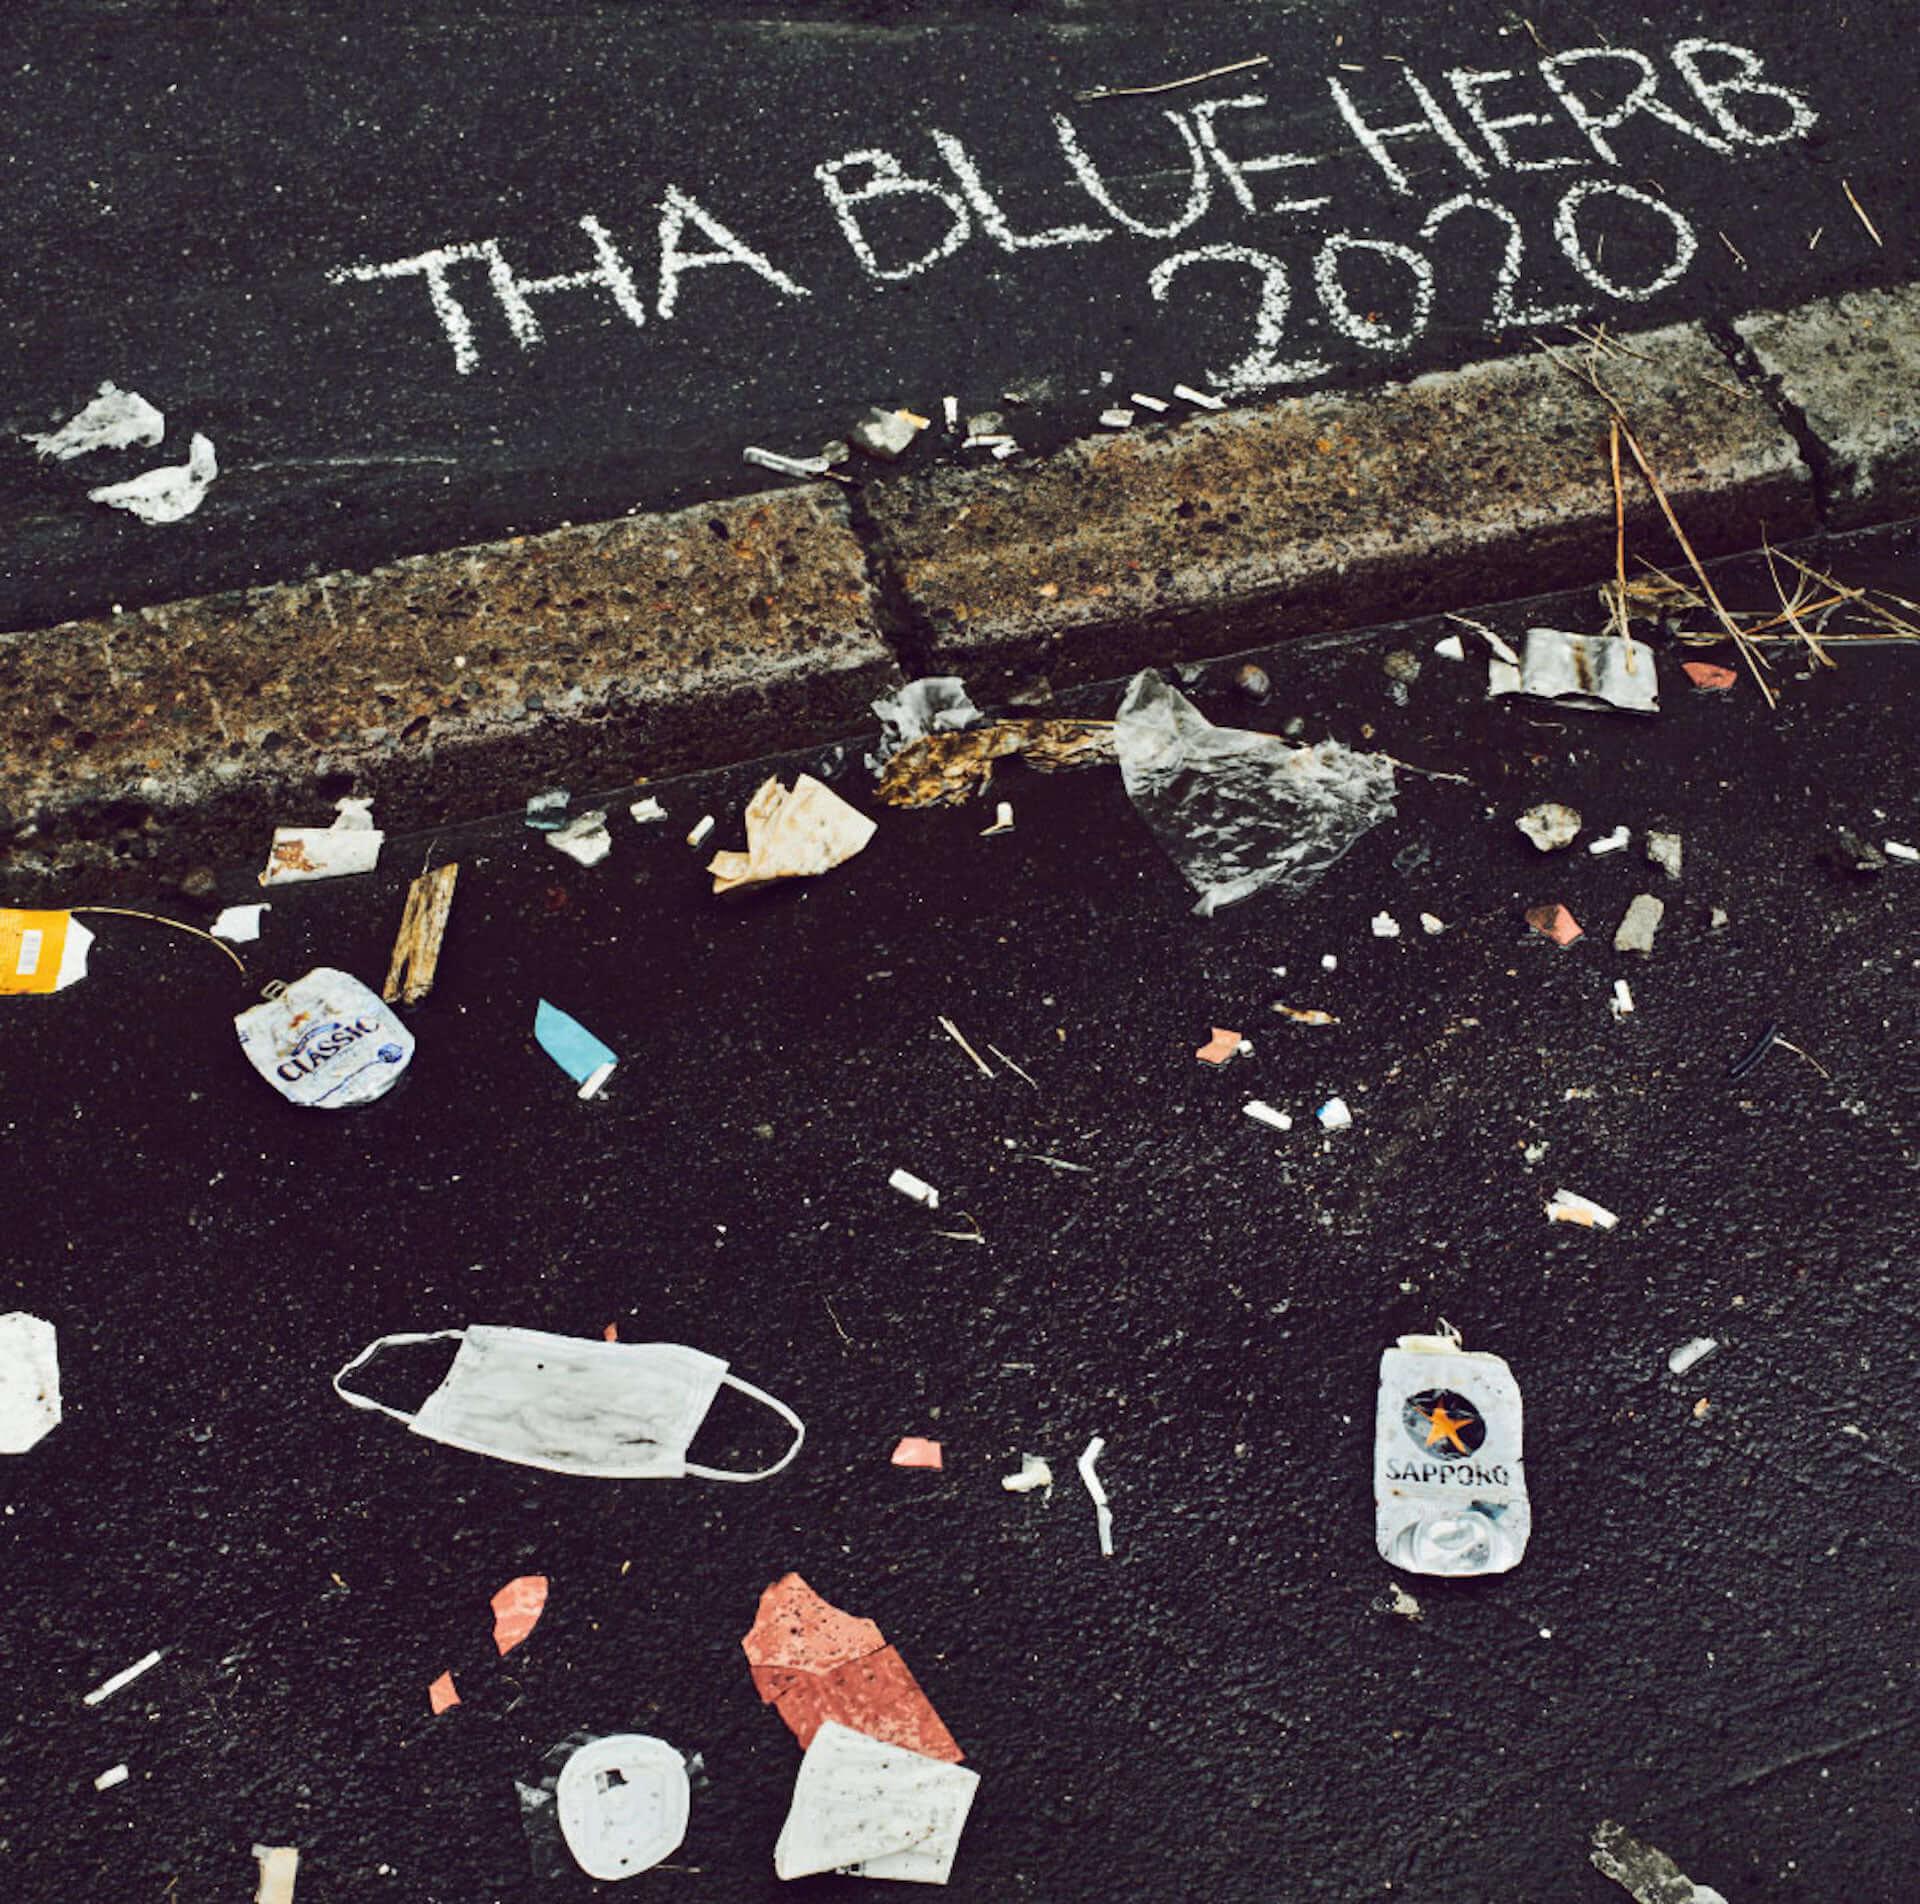 THA BLUE HERBの1年振りの最新作『2020』が発売決定|「遠ざかってしまったかつての日常を、曲にしました」 music200601_thablueherb_2-1920x1904